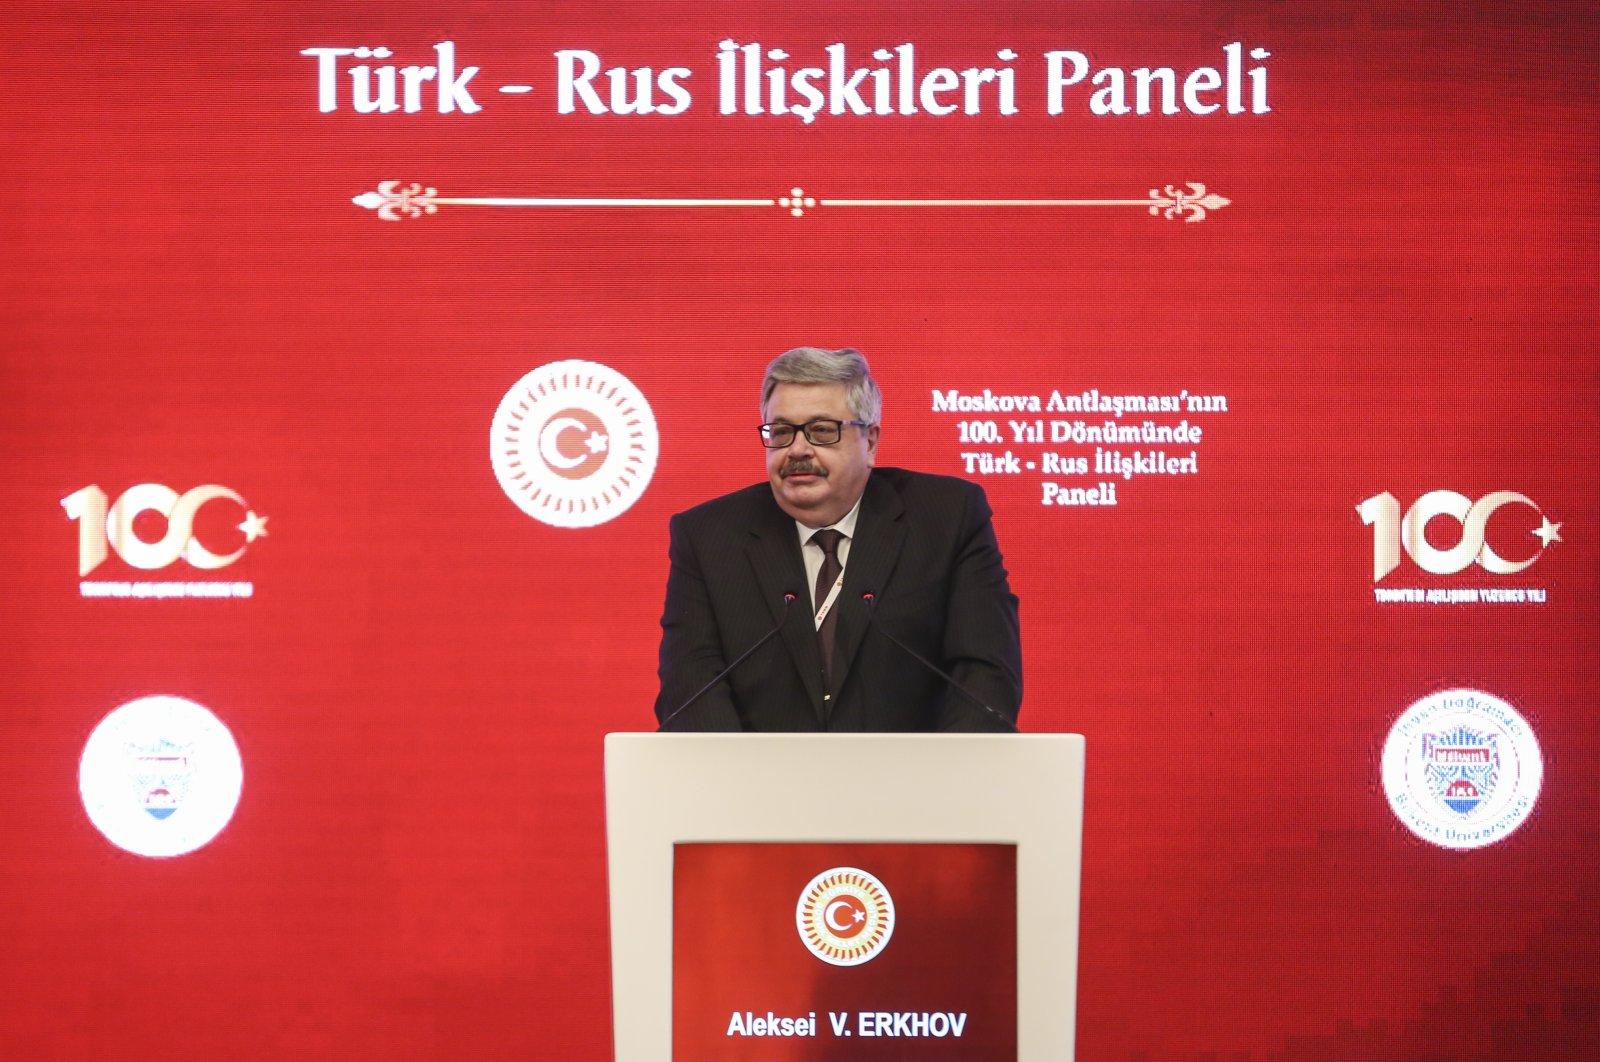 Russian Ambassador Aleksei Erkhov speaking at the centennial anniversary panel of the Treaty of Brotherhood, Ankara, Turkey, March 15, 2021 (AA Photo)